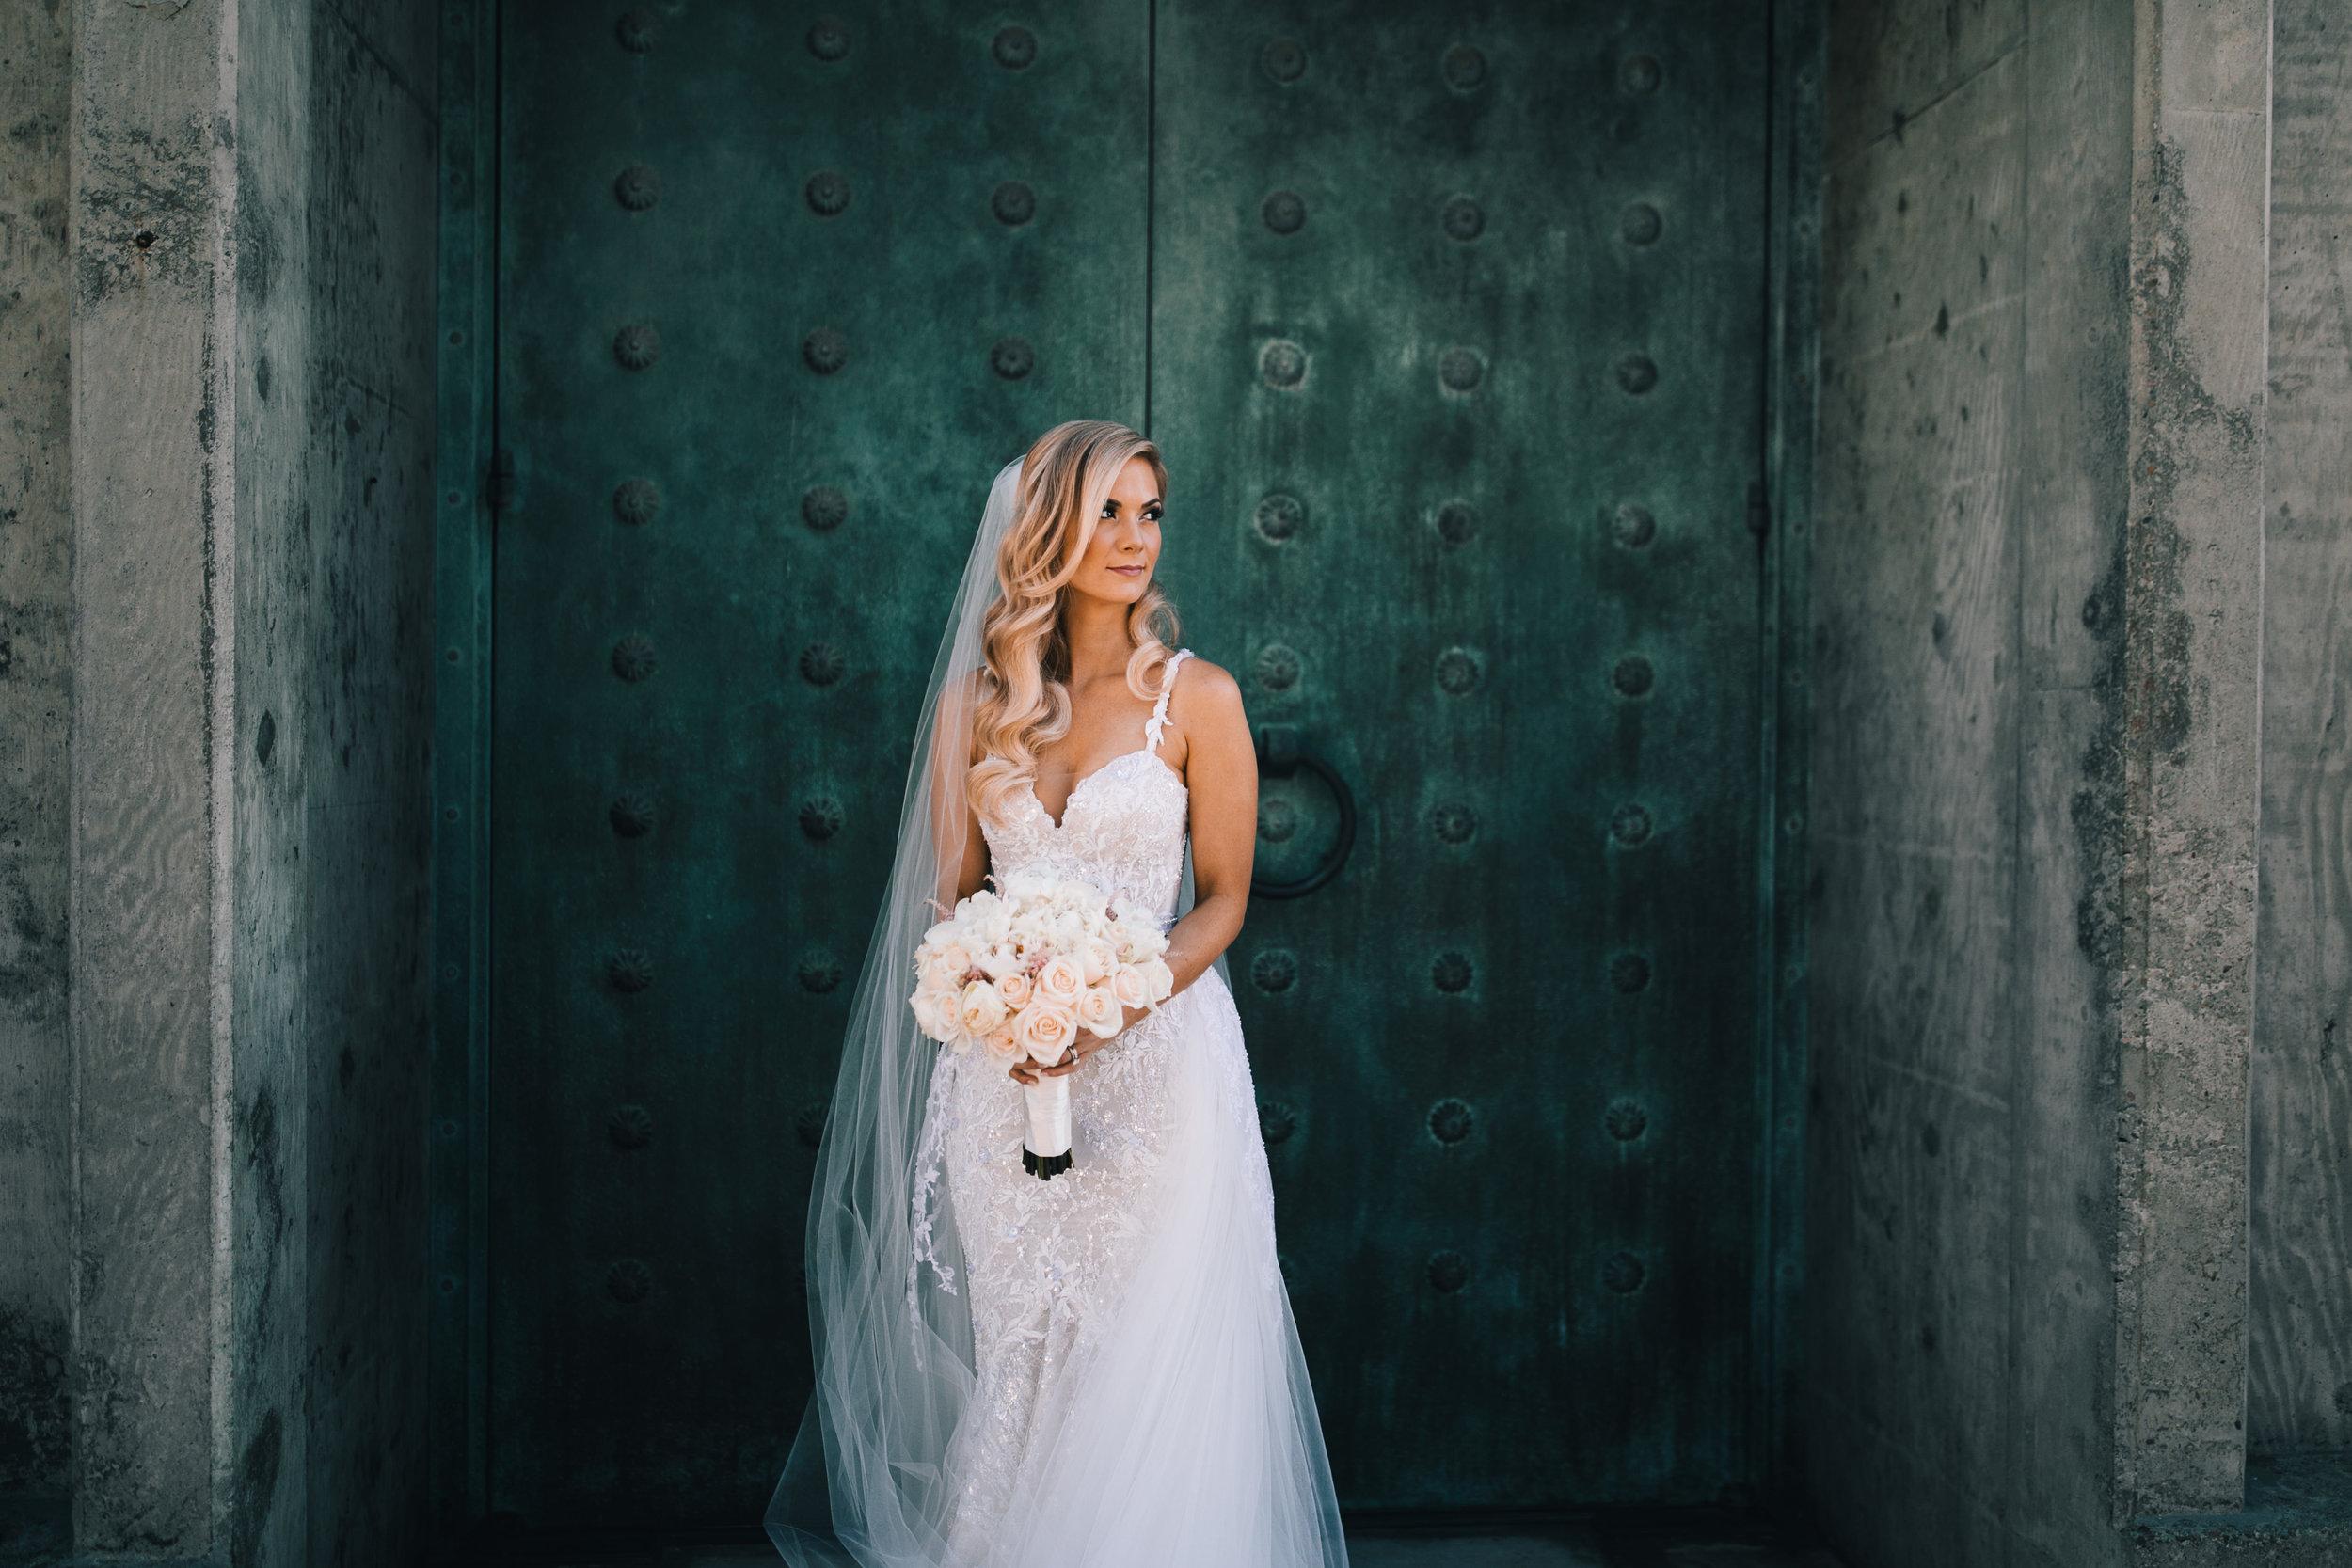 2018.09.08 Litsa and Sofo Greek Wedding Sneak Peak-4.jpg